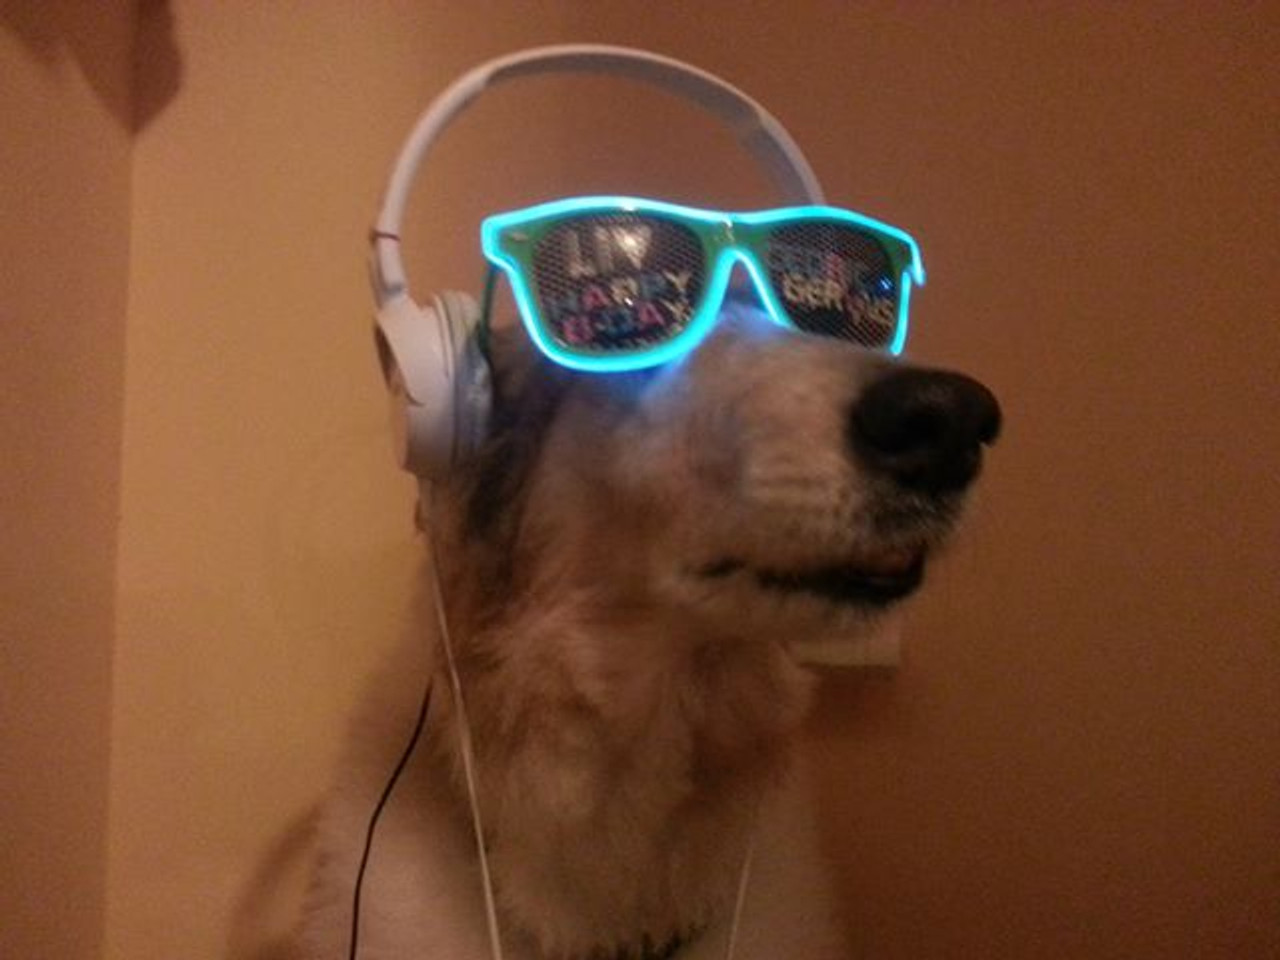 LED, Lightup, promo, glasses, Glow-Glasses, Glow, LED,